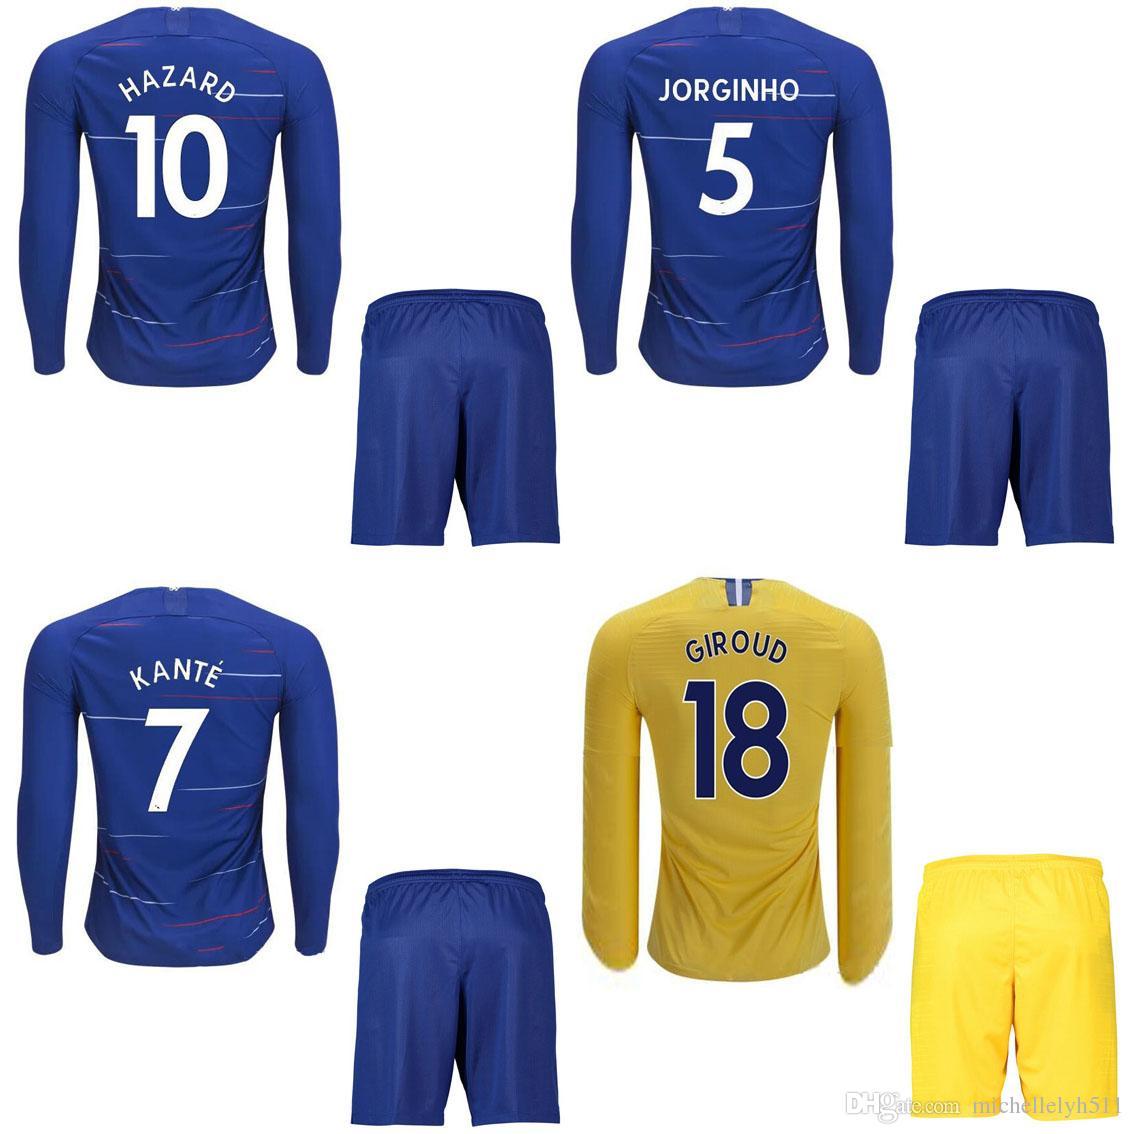 2019 18 19 New Long Sleeve Soccer Kits For Men Home Away 2018 19 HAZARD  MORATA KANTE JORGINHO Footbll Jersey Shorts Adult Sports Training Sets From  ... 60ba92ad3